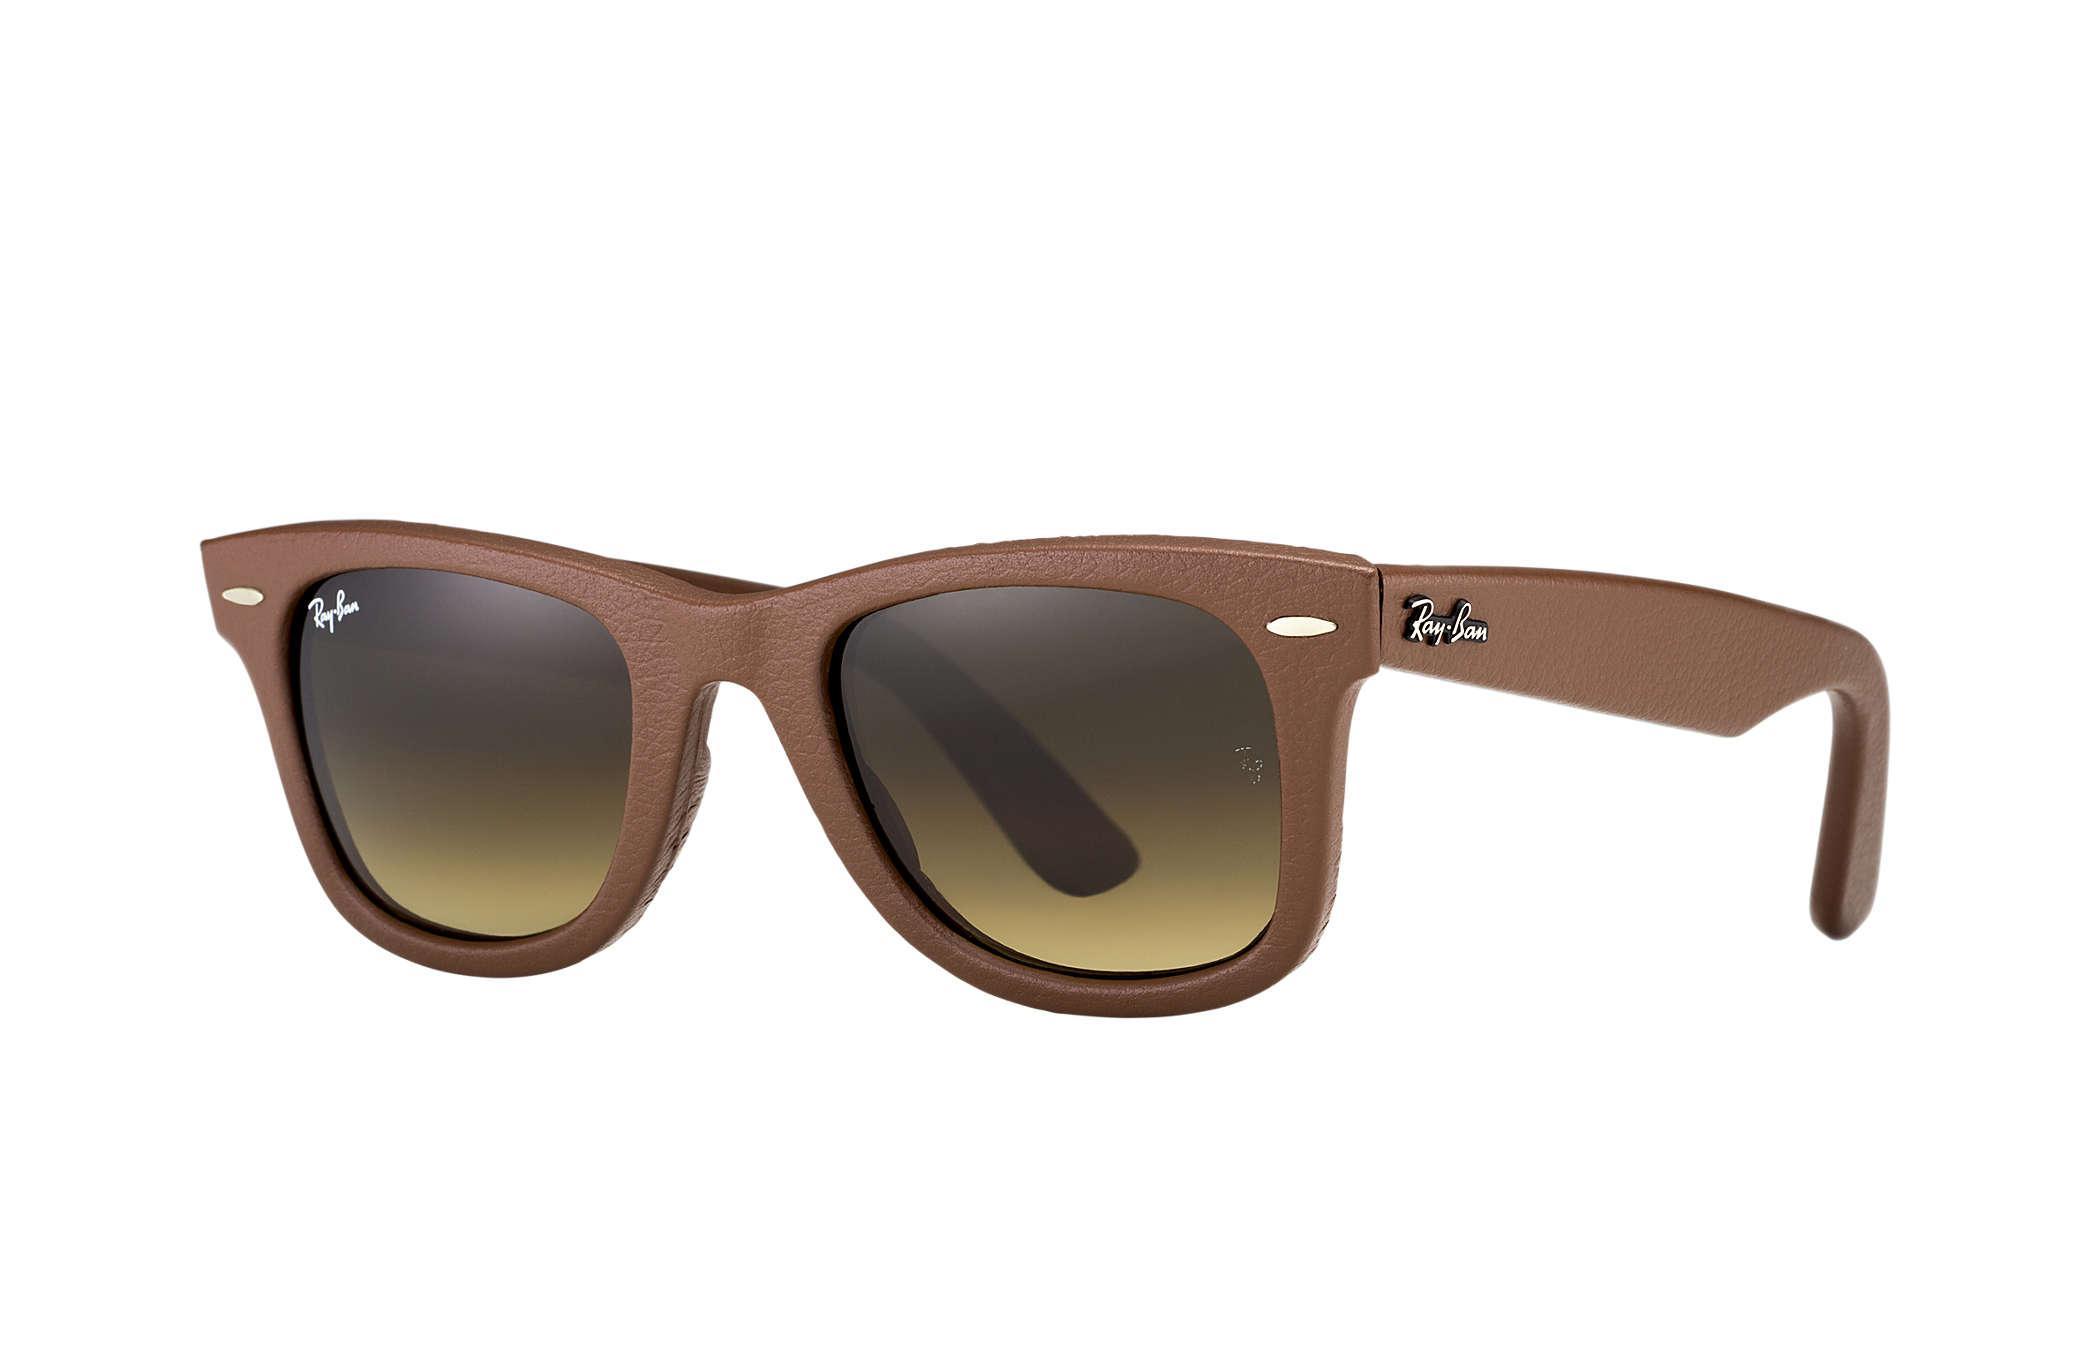 cc6dcd72f4 Lyst - Ray-Ban Wayfarer Leather in Brown